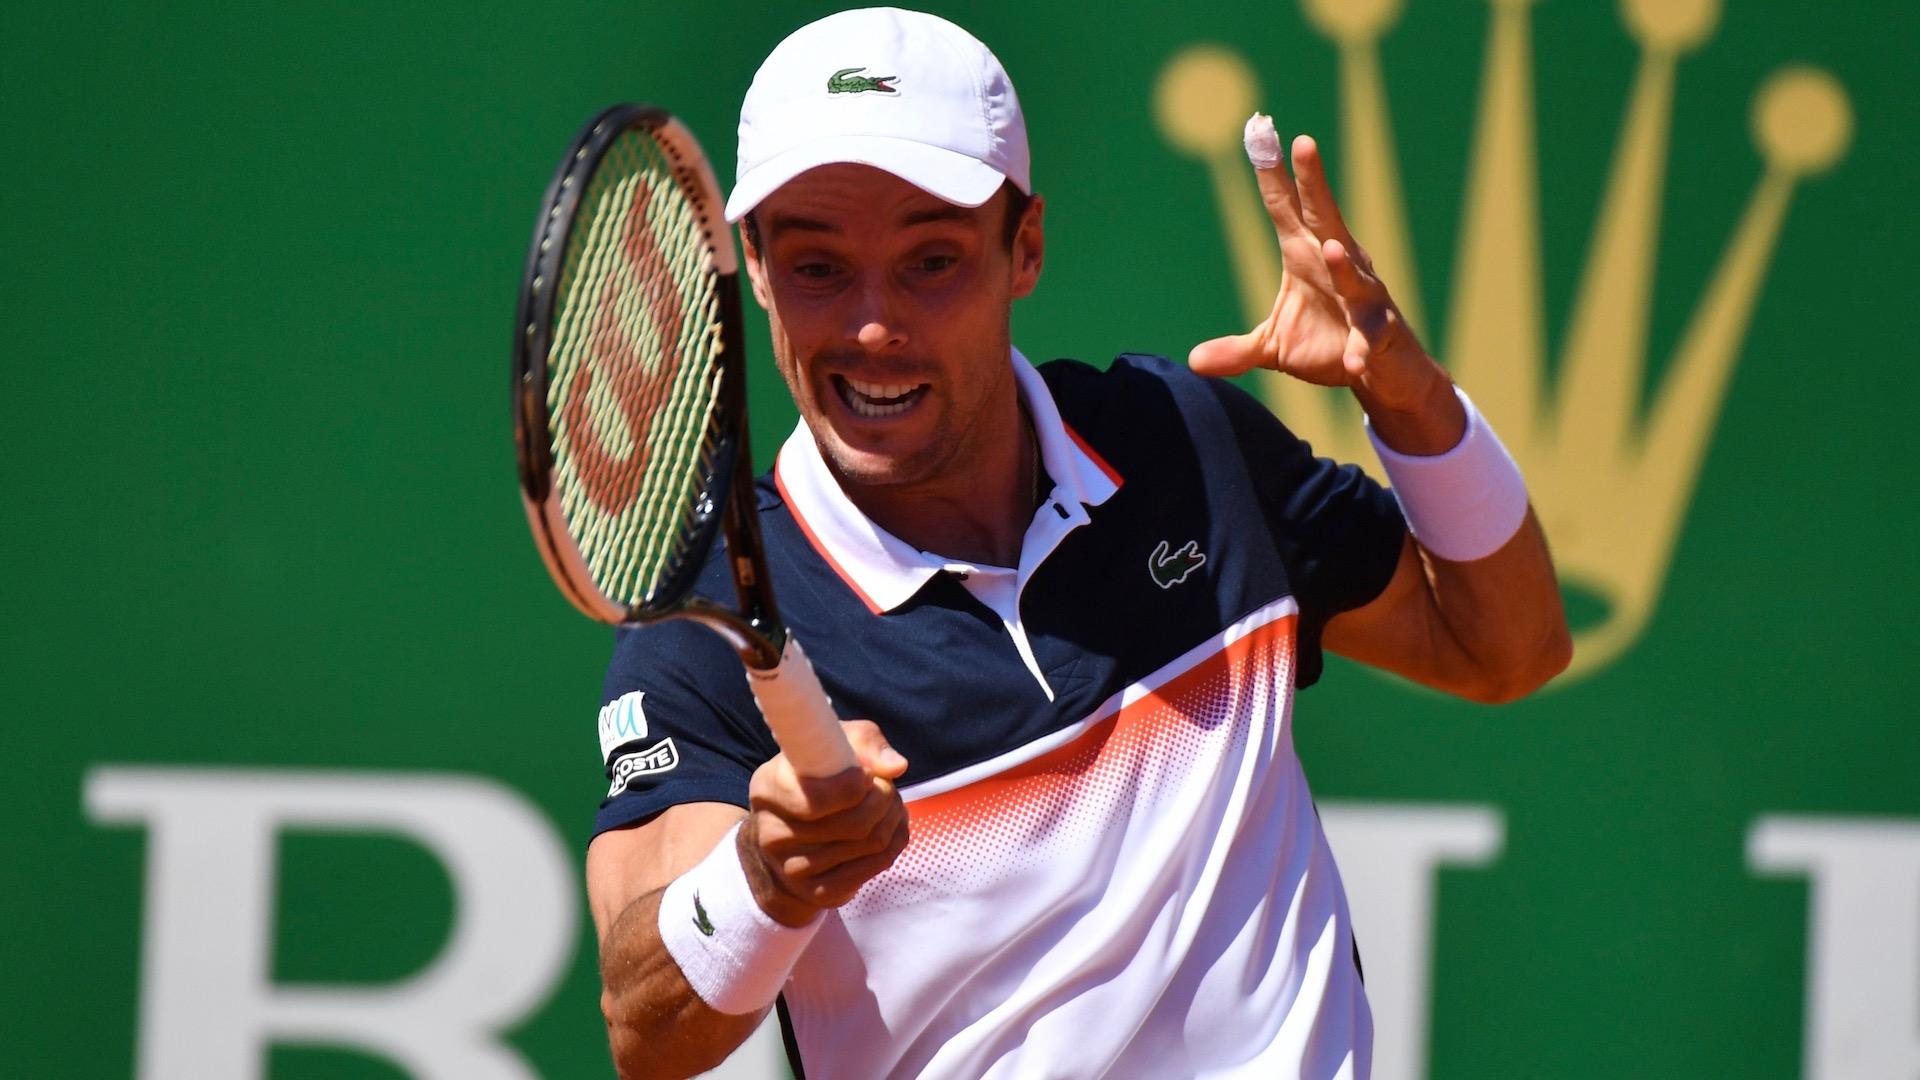 Monte-Carlo Masters 2021: Roberto Bautista Agut vs. Taylor Fritz Tennis Pick and Prediction